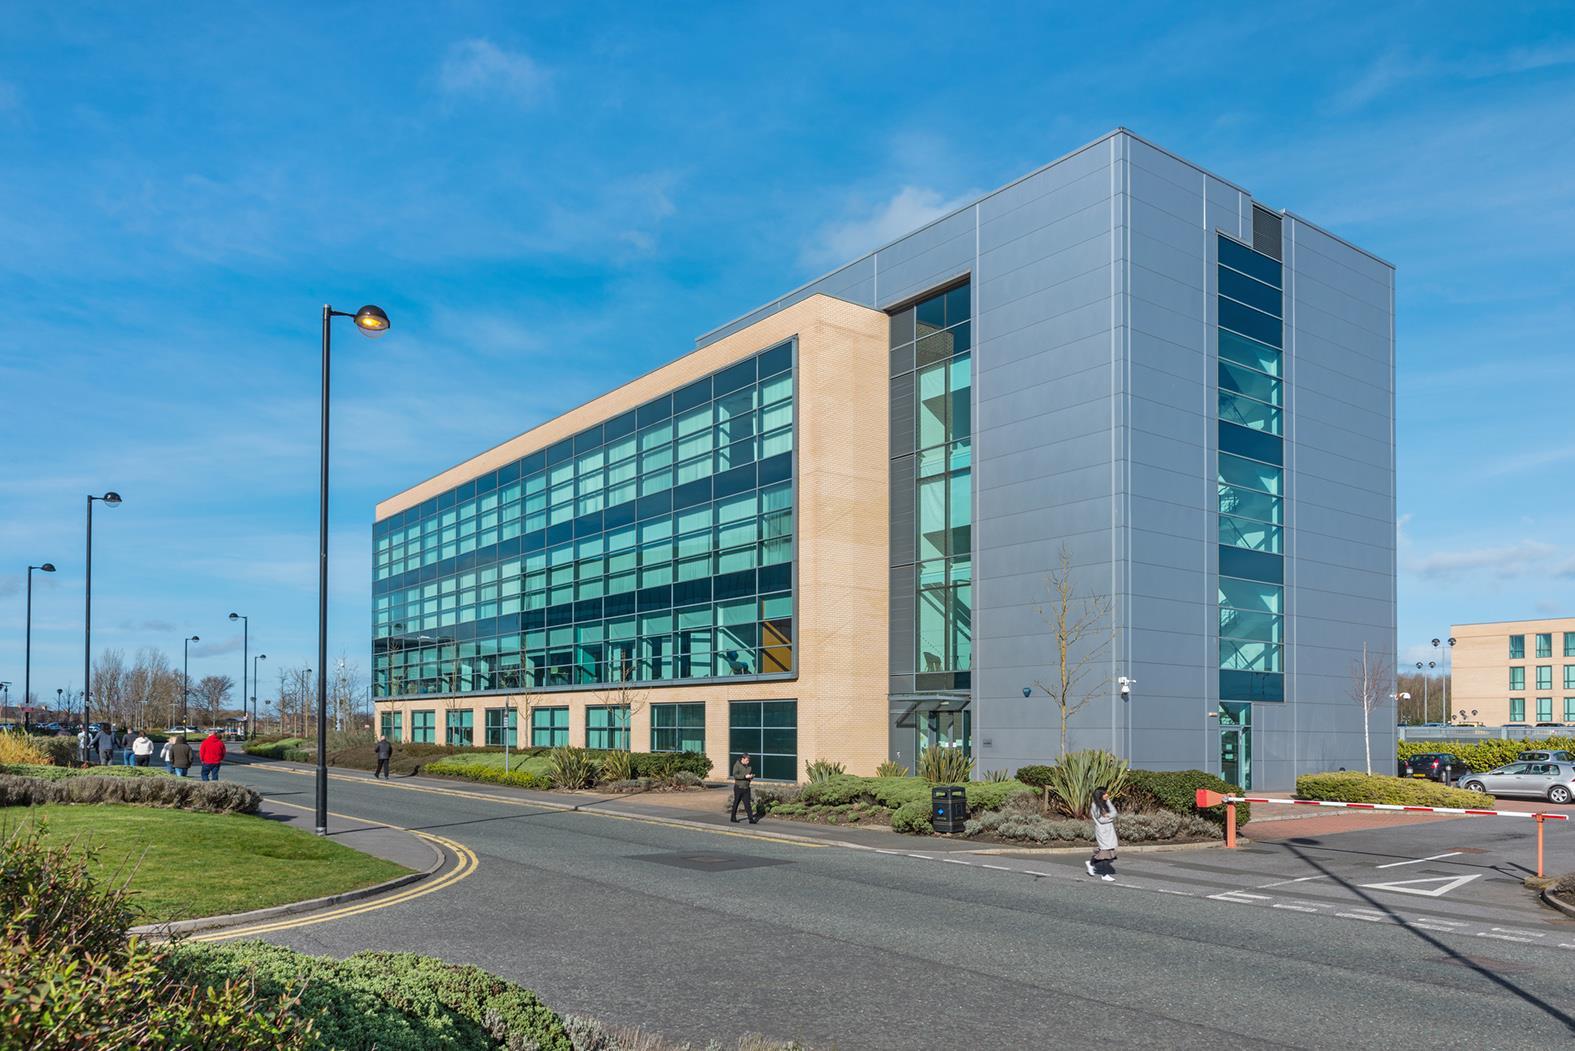 Quadrant West, Cobalt Business Park , North Tyneside , Newcastle Upon Tyne, Tyne And Wear, NE27